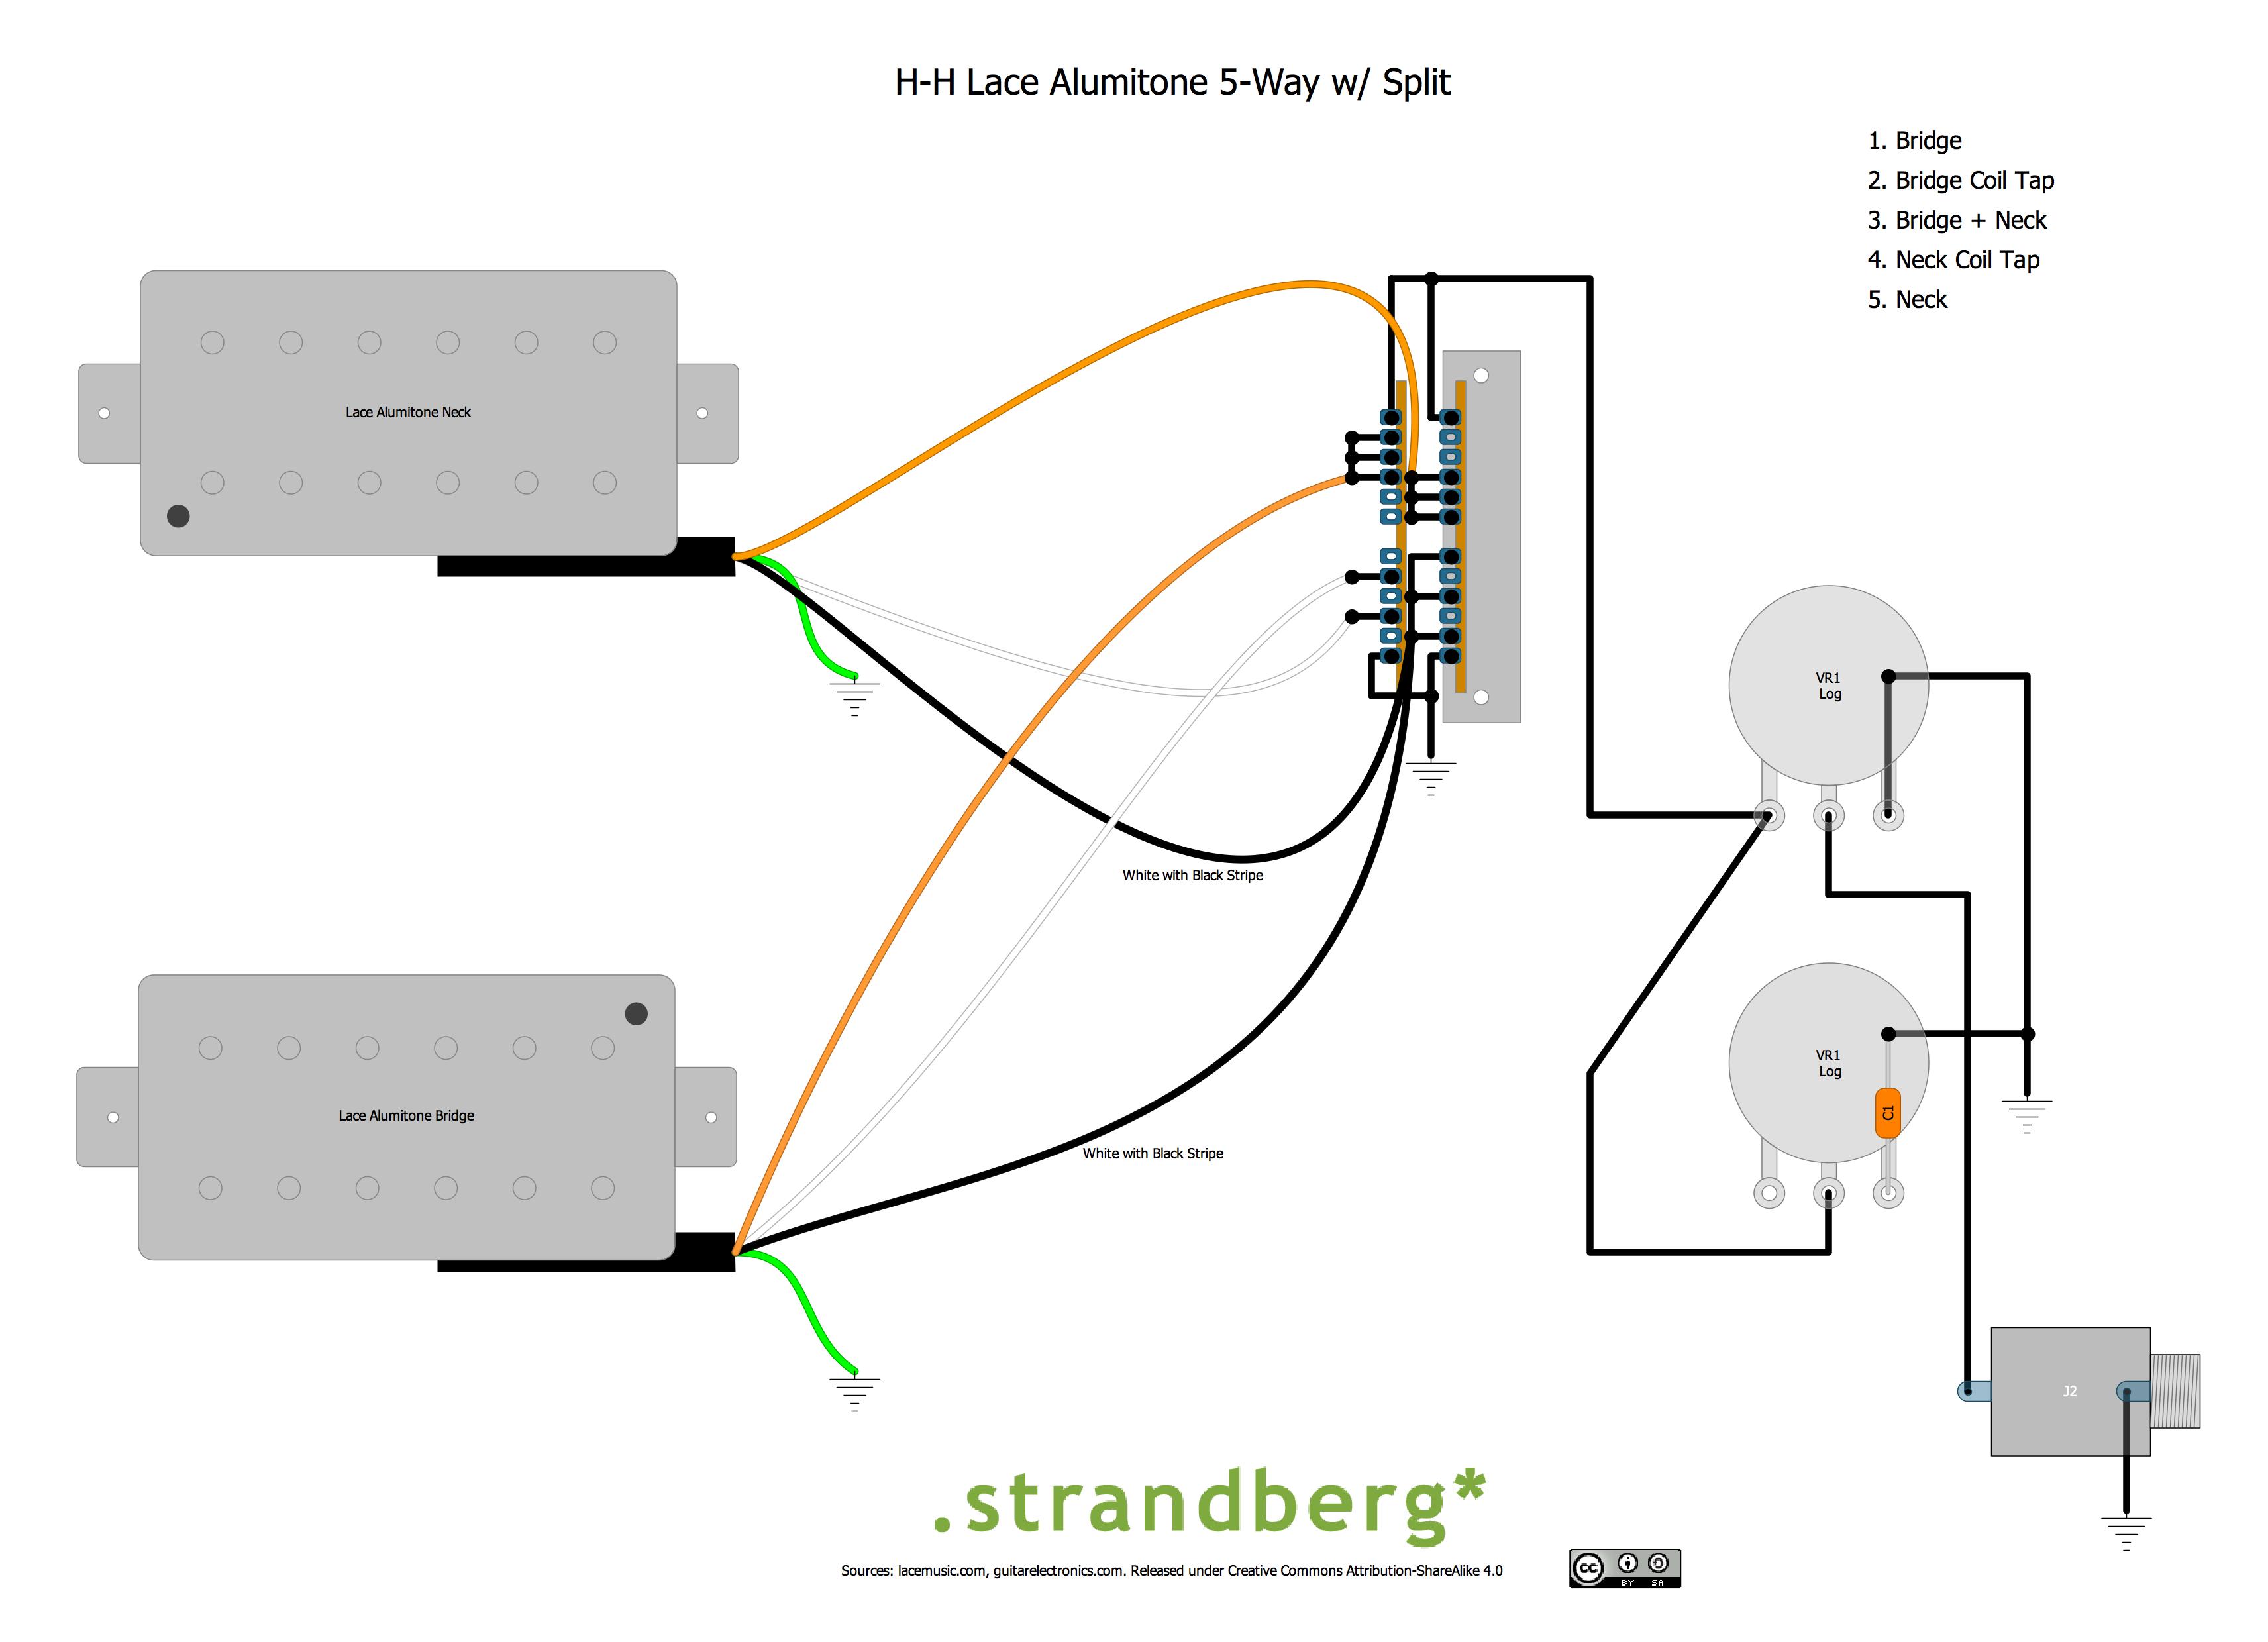 [SCHEMATICS_48DE]  GE_5094] Telecaster Alumitone Wiring Diagram | Lace Hemi Humbucker Wiring Diagrams |  | Habi Tobiq Knie Itive Urga Cette Nnigh Timew Inrebe Mohammedshrine Librar  Wiring 101